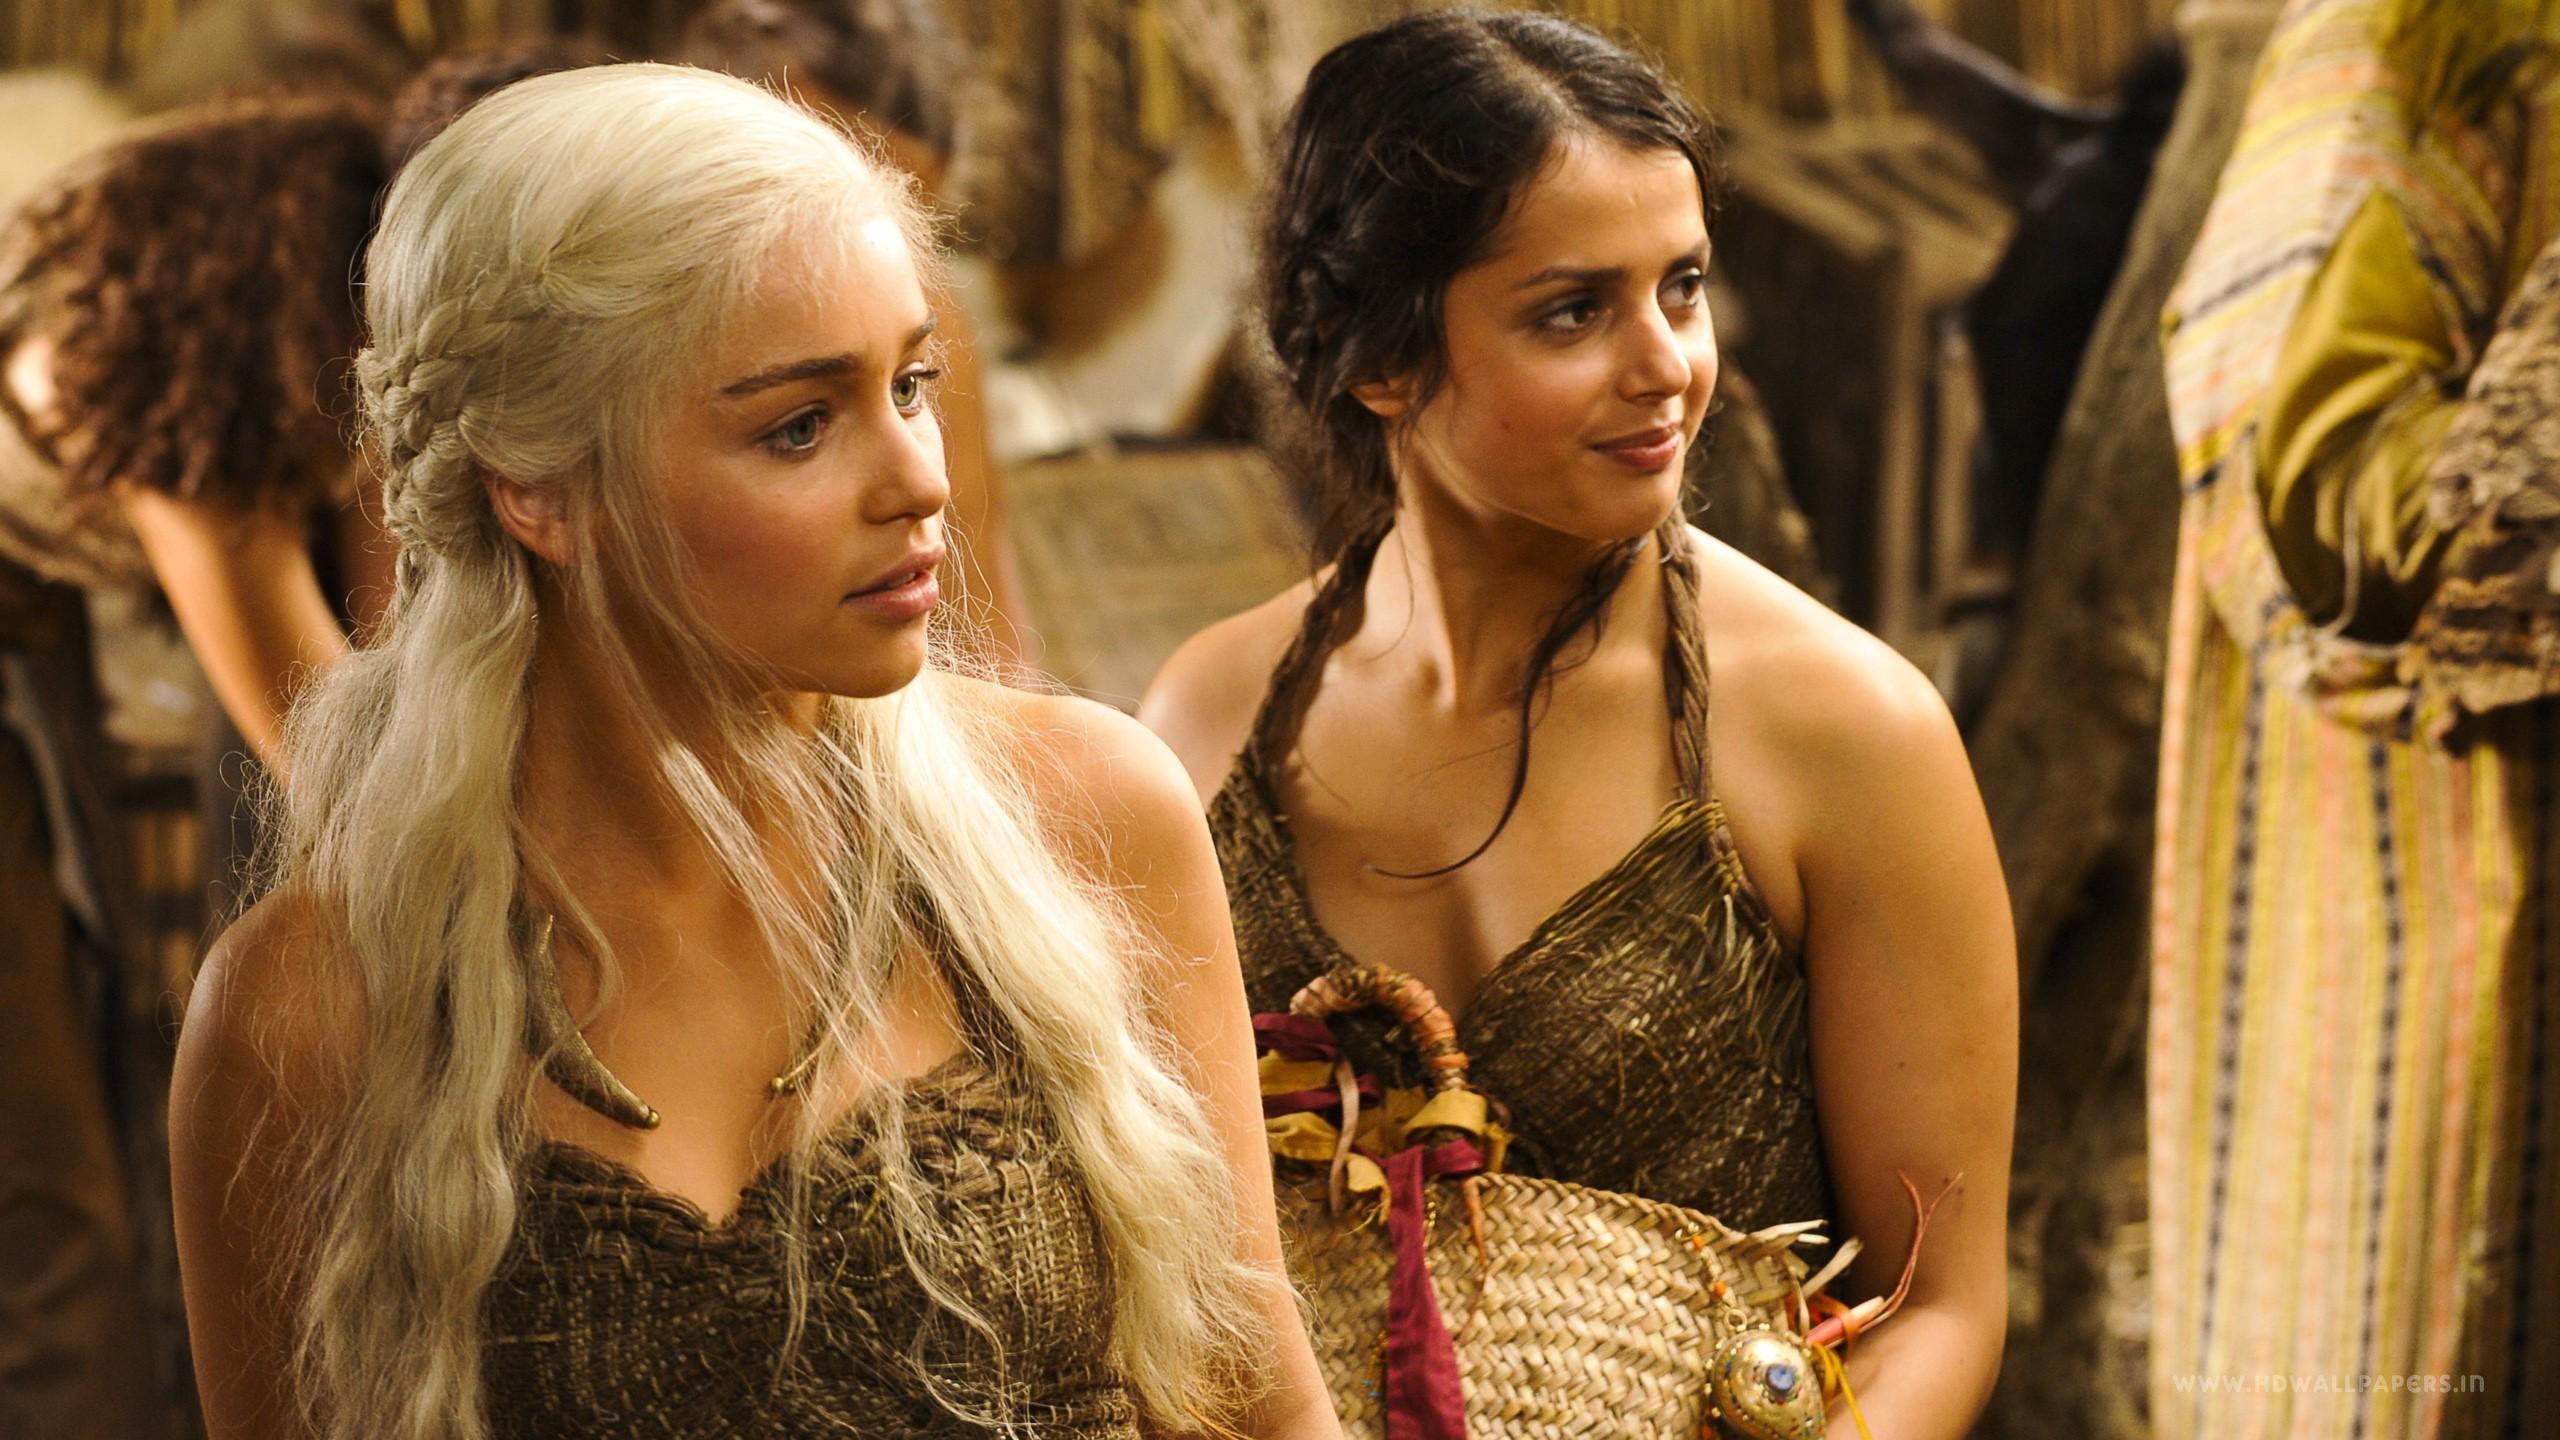 … x 1440 Original. Description: Download Daenerys Targaryen …